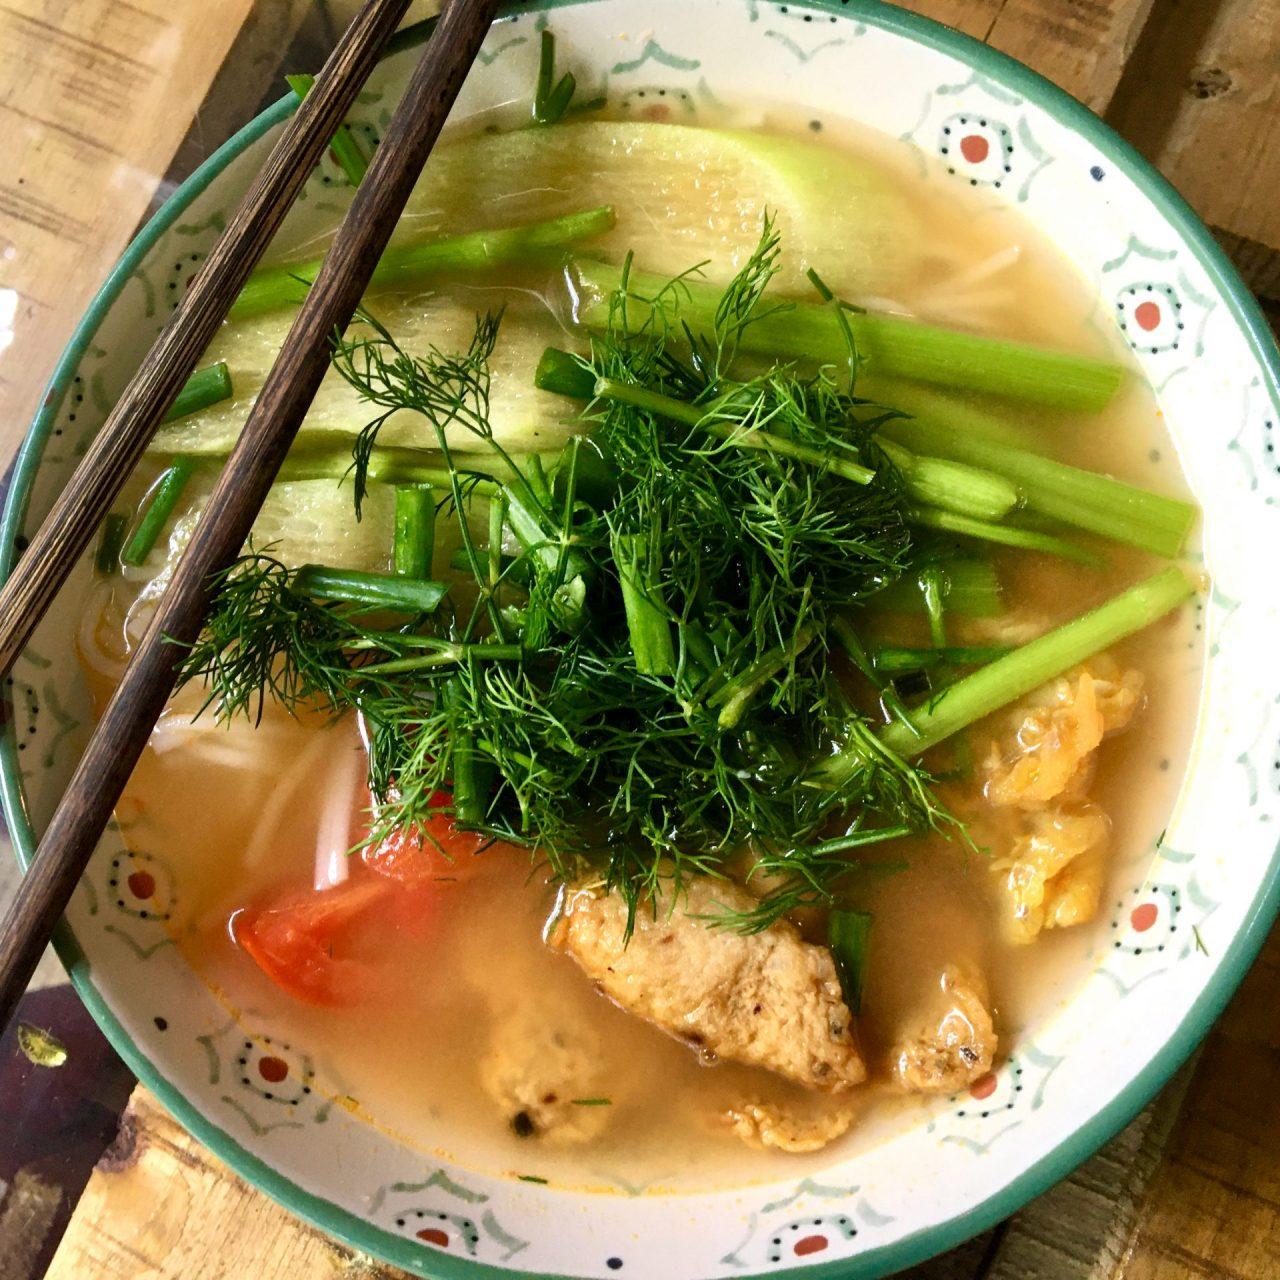 Bún Cá Hải Phòng - Fried Fish Noodle Soup from Hai Phong